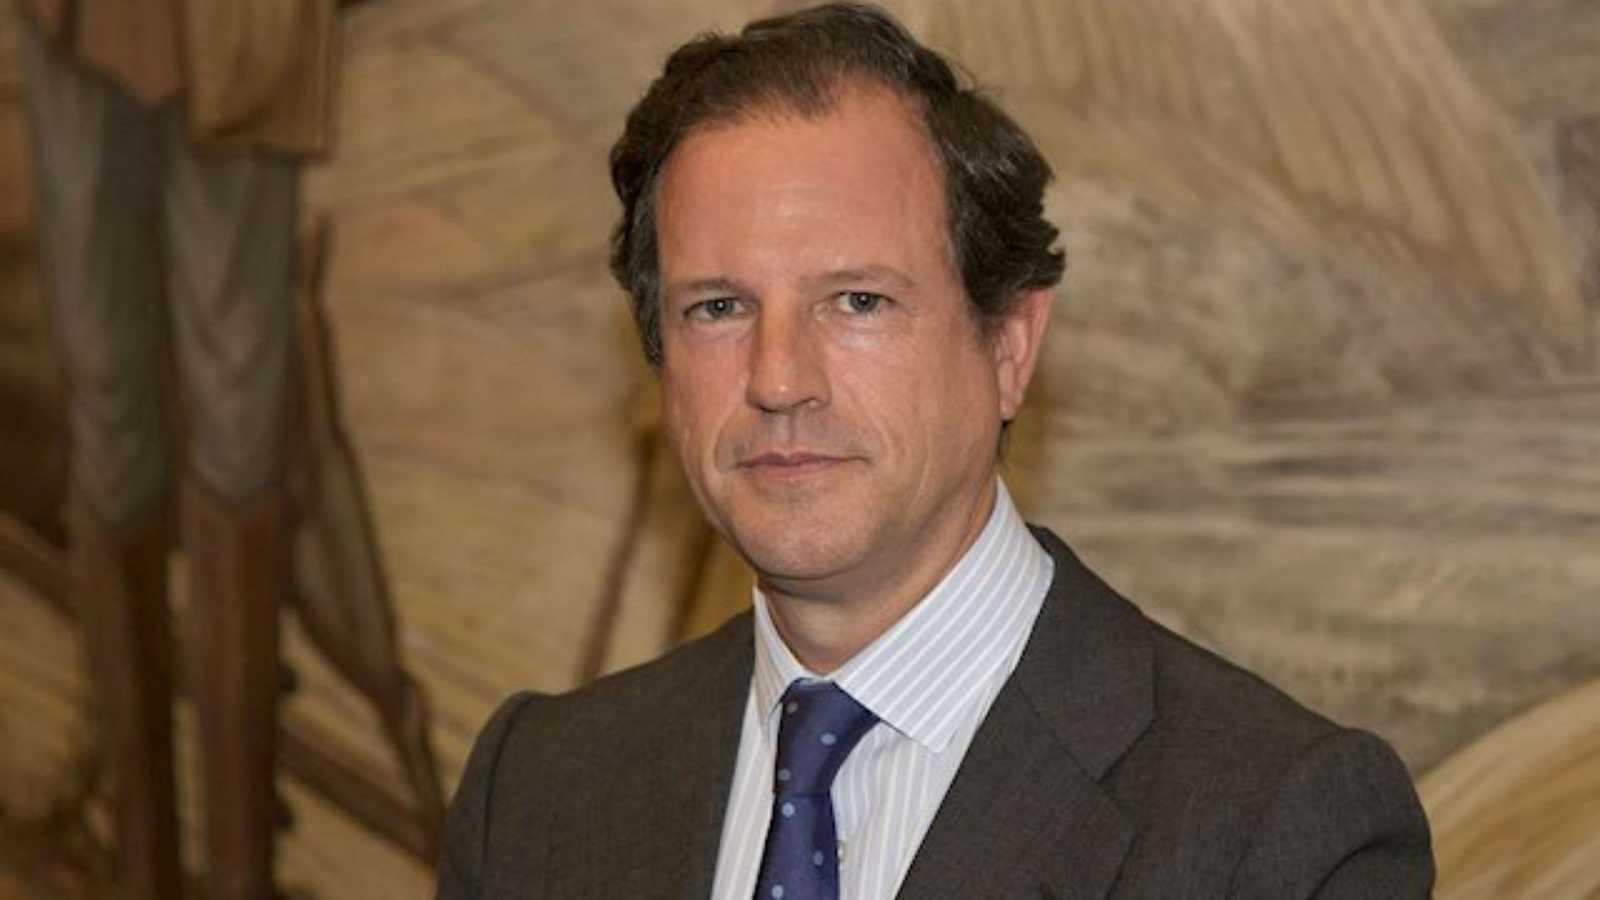 "Agro 5 - Un acuerdo pesquero en Europa ""satisfactorio"" para 2020 - 21/12/19"